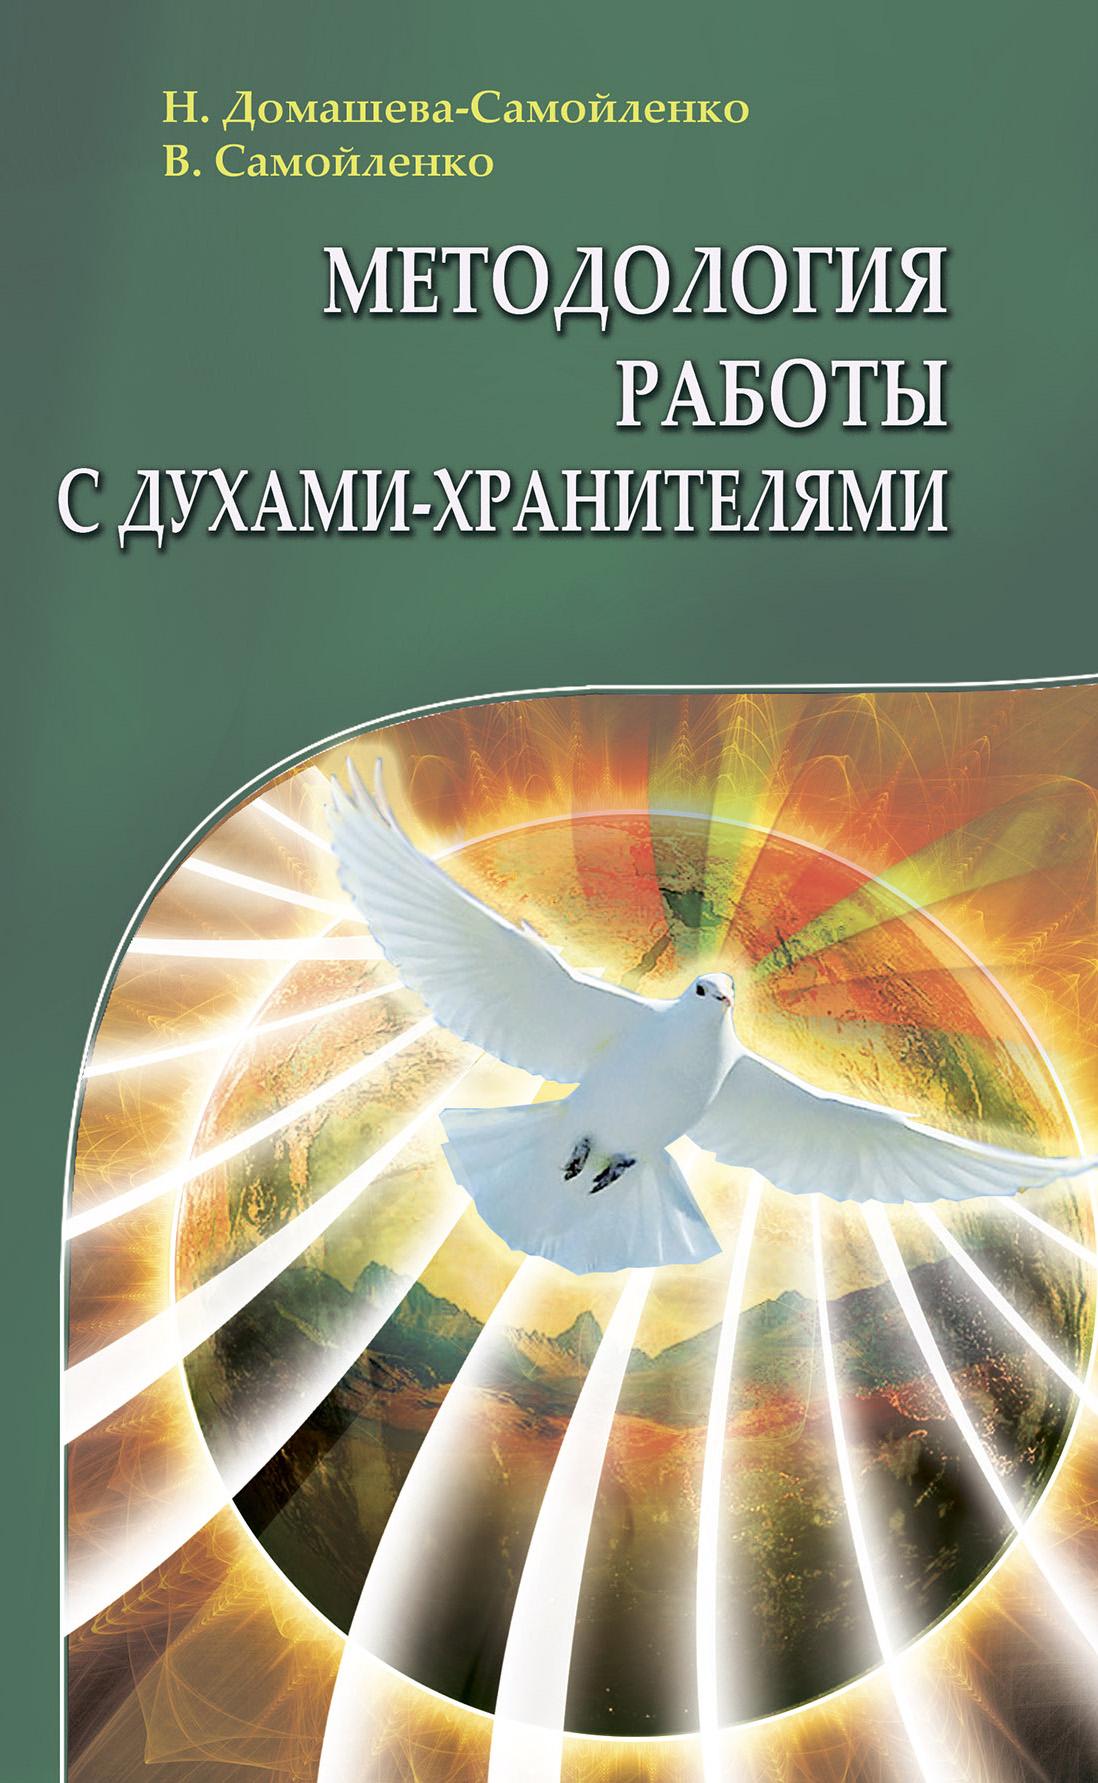 Надежда Домашева-Самойленко Методология работы с Духами-Хранителями